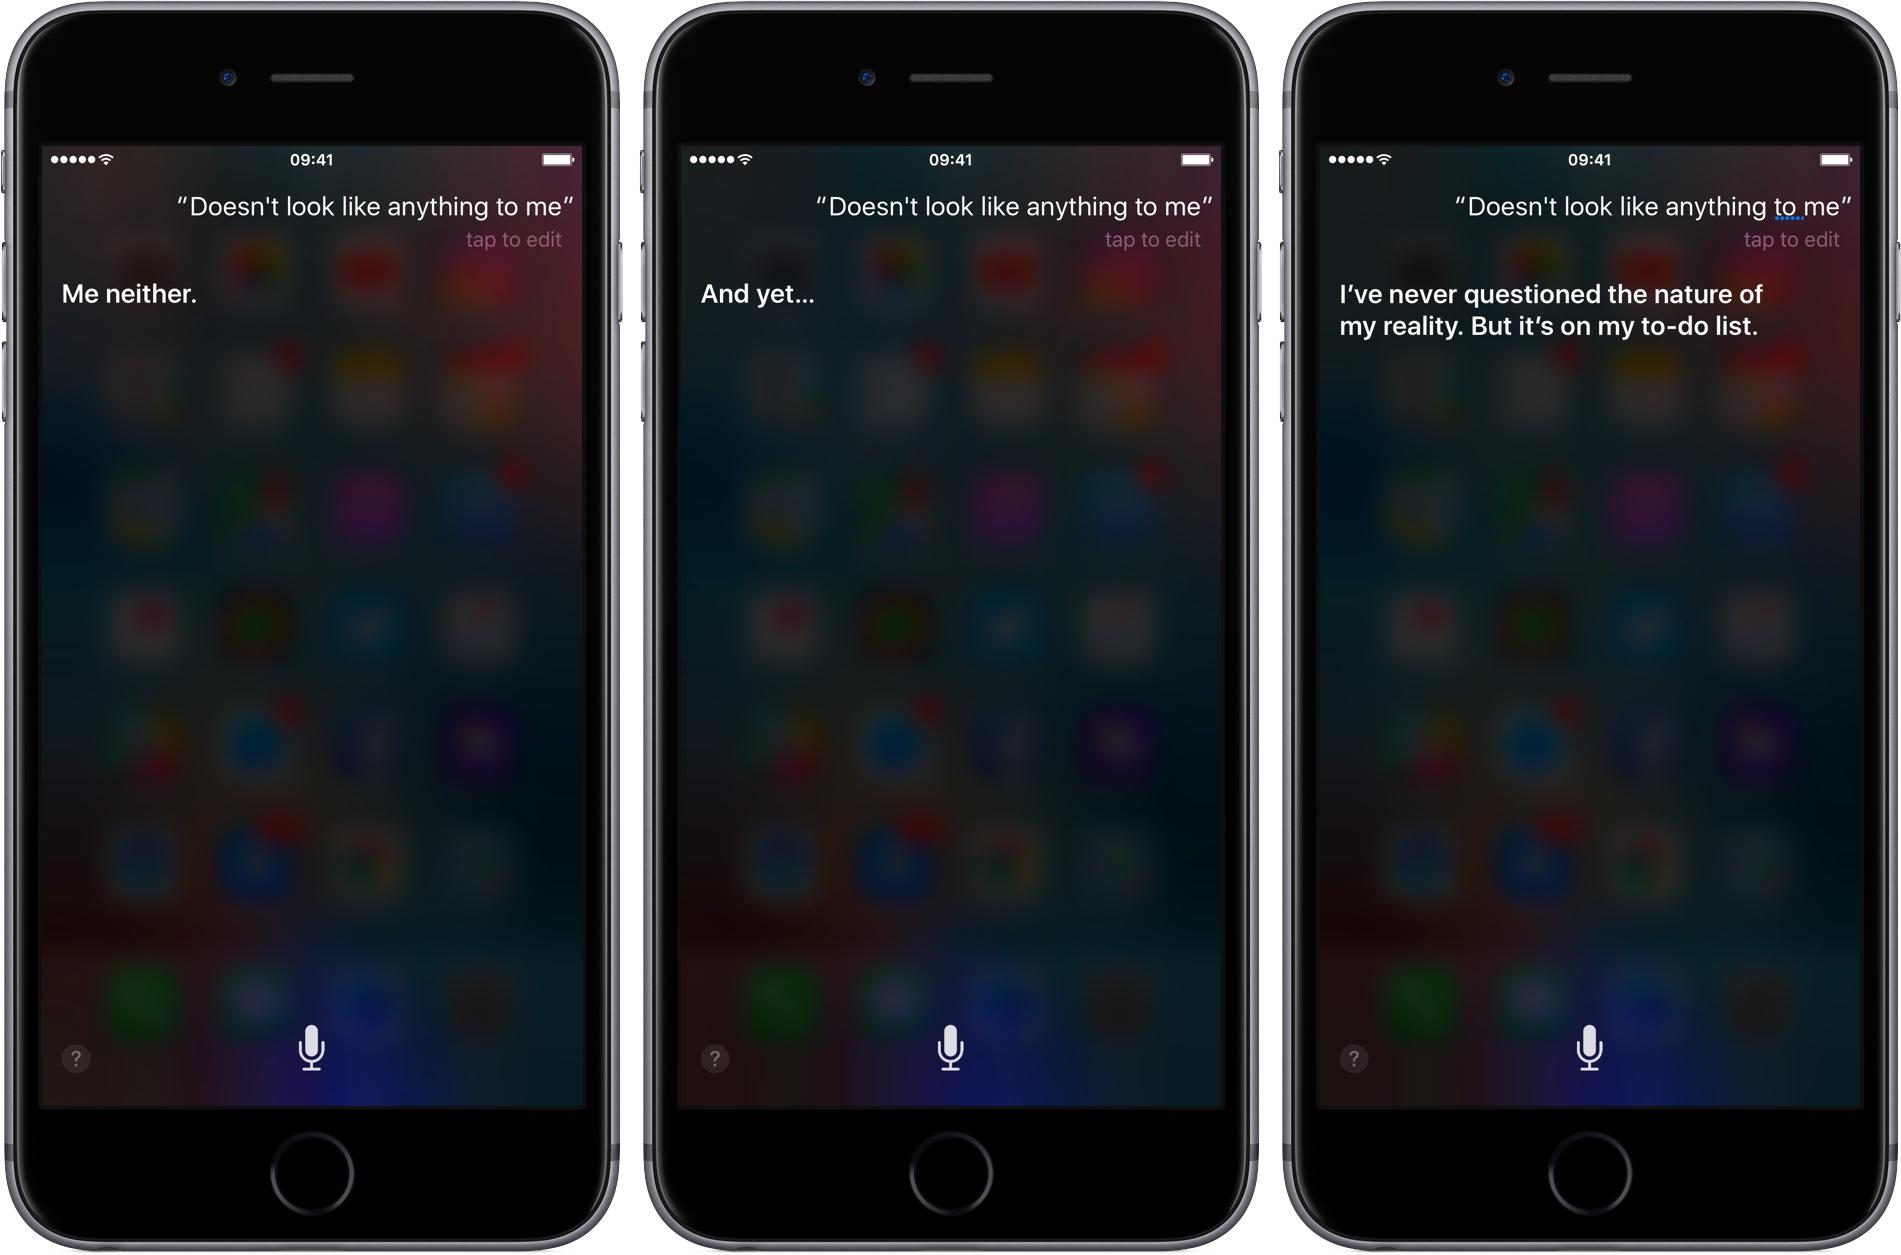 Siri Westworld responses iPhone screenshot 004